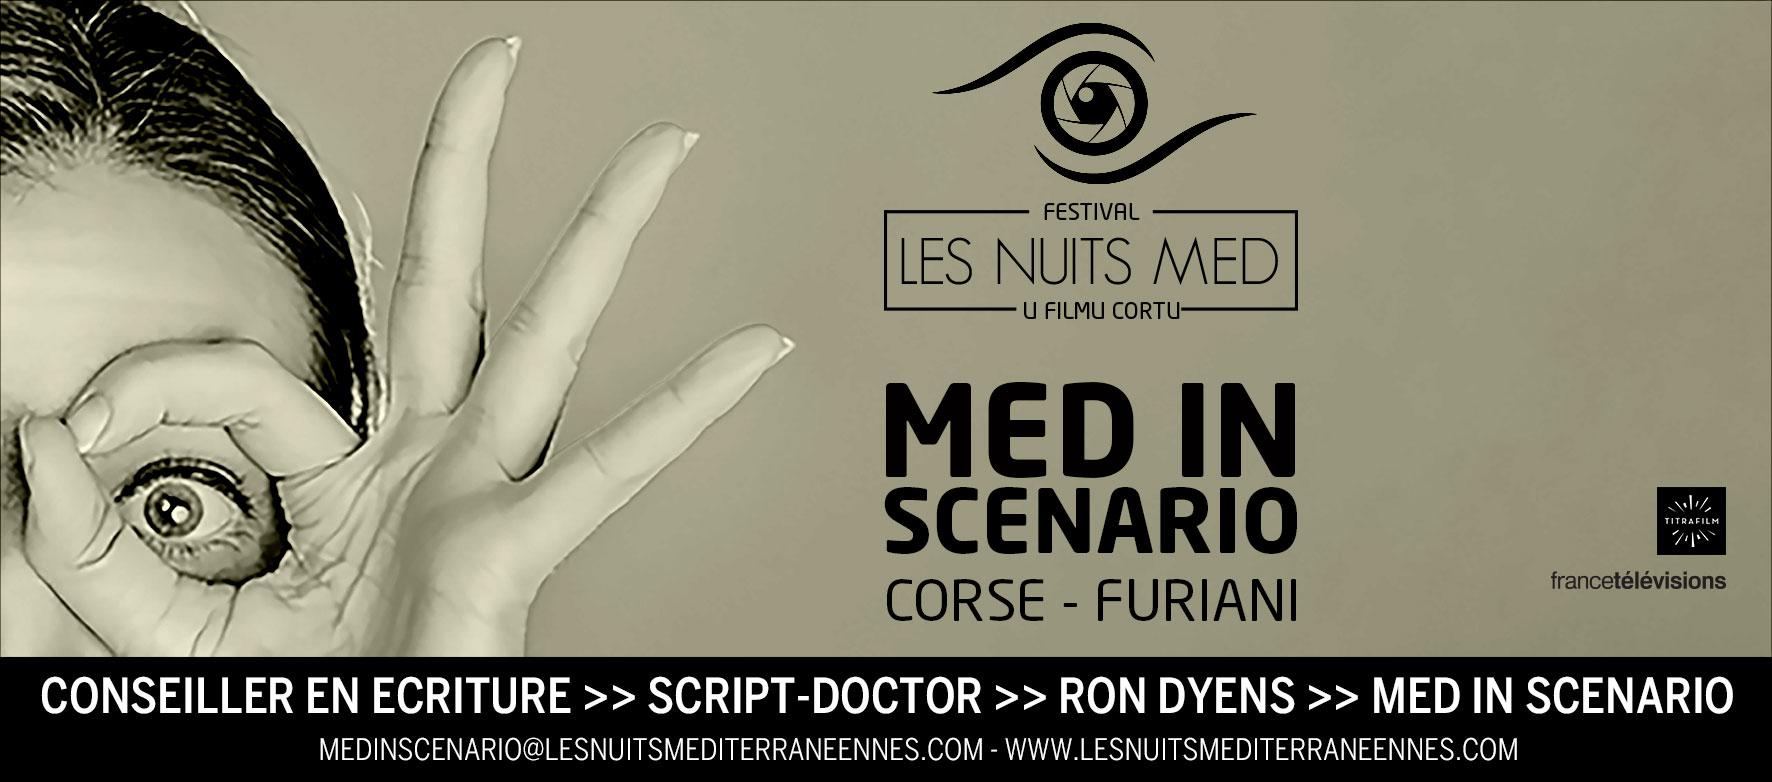 Nuits-MED-MED-IN-SCENARIO-Script-doctor